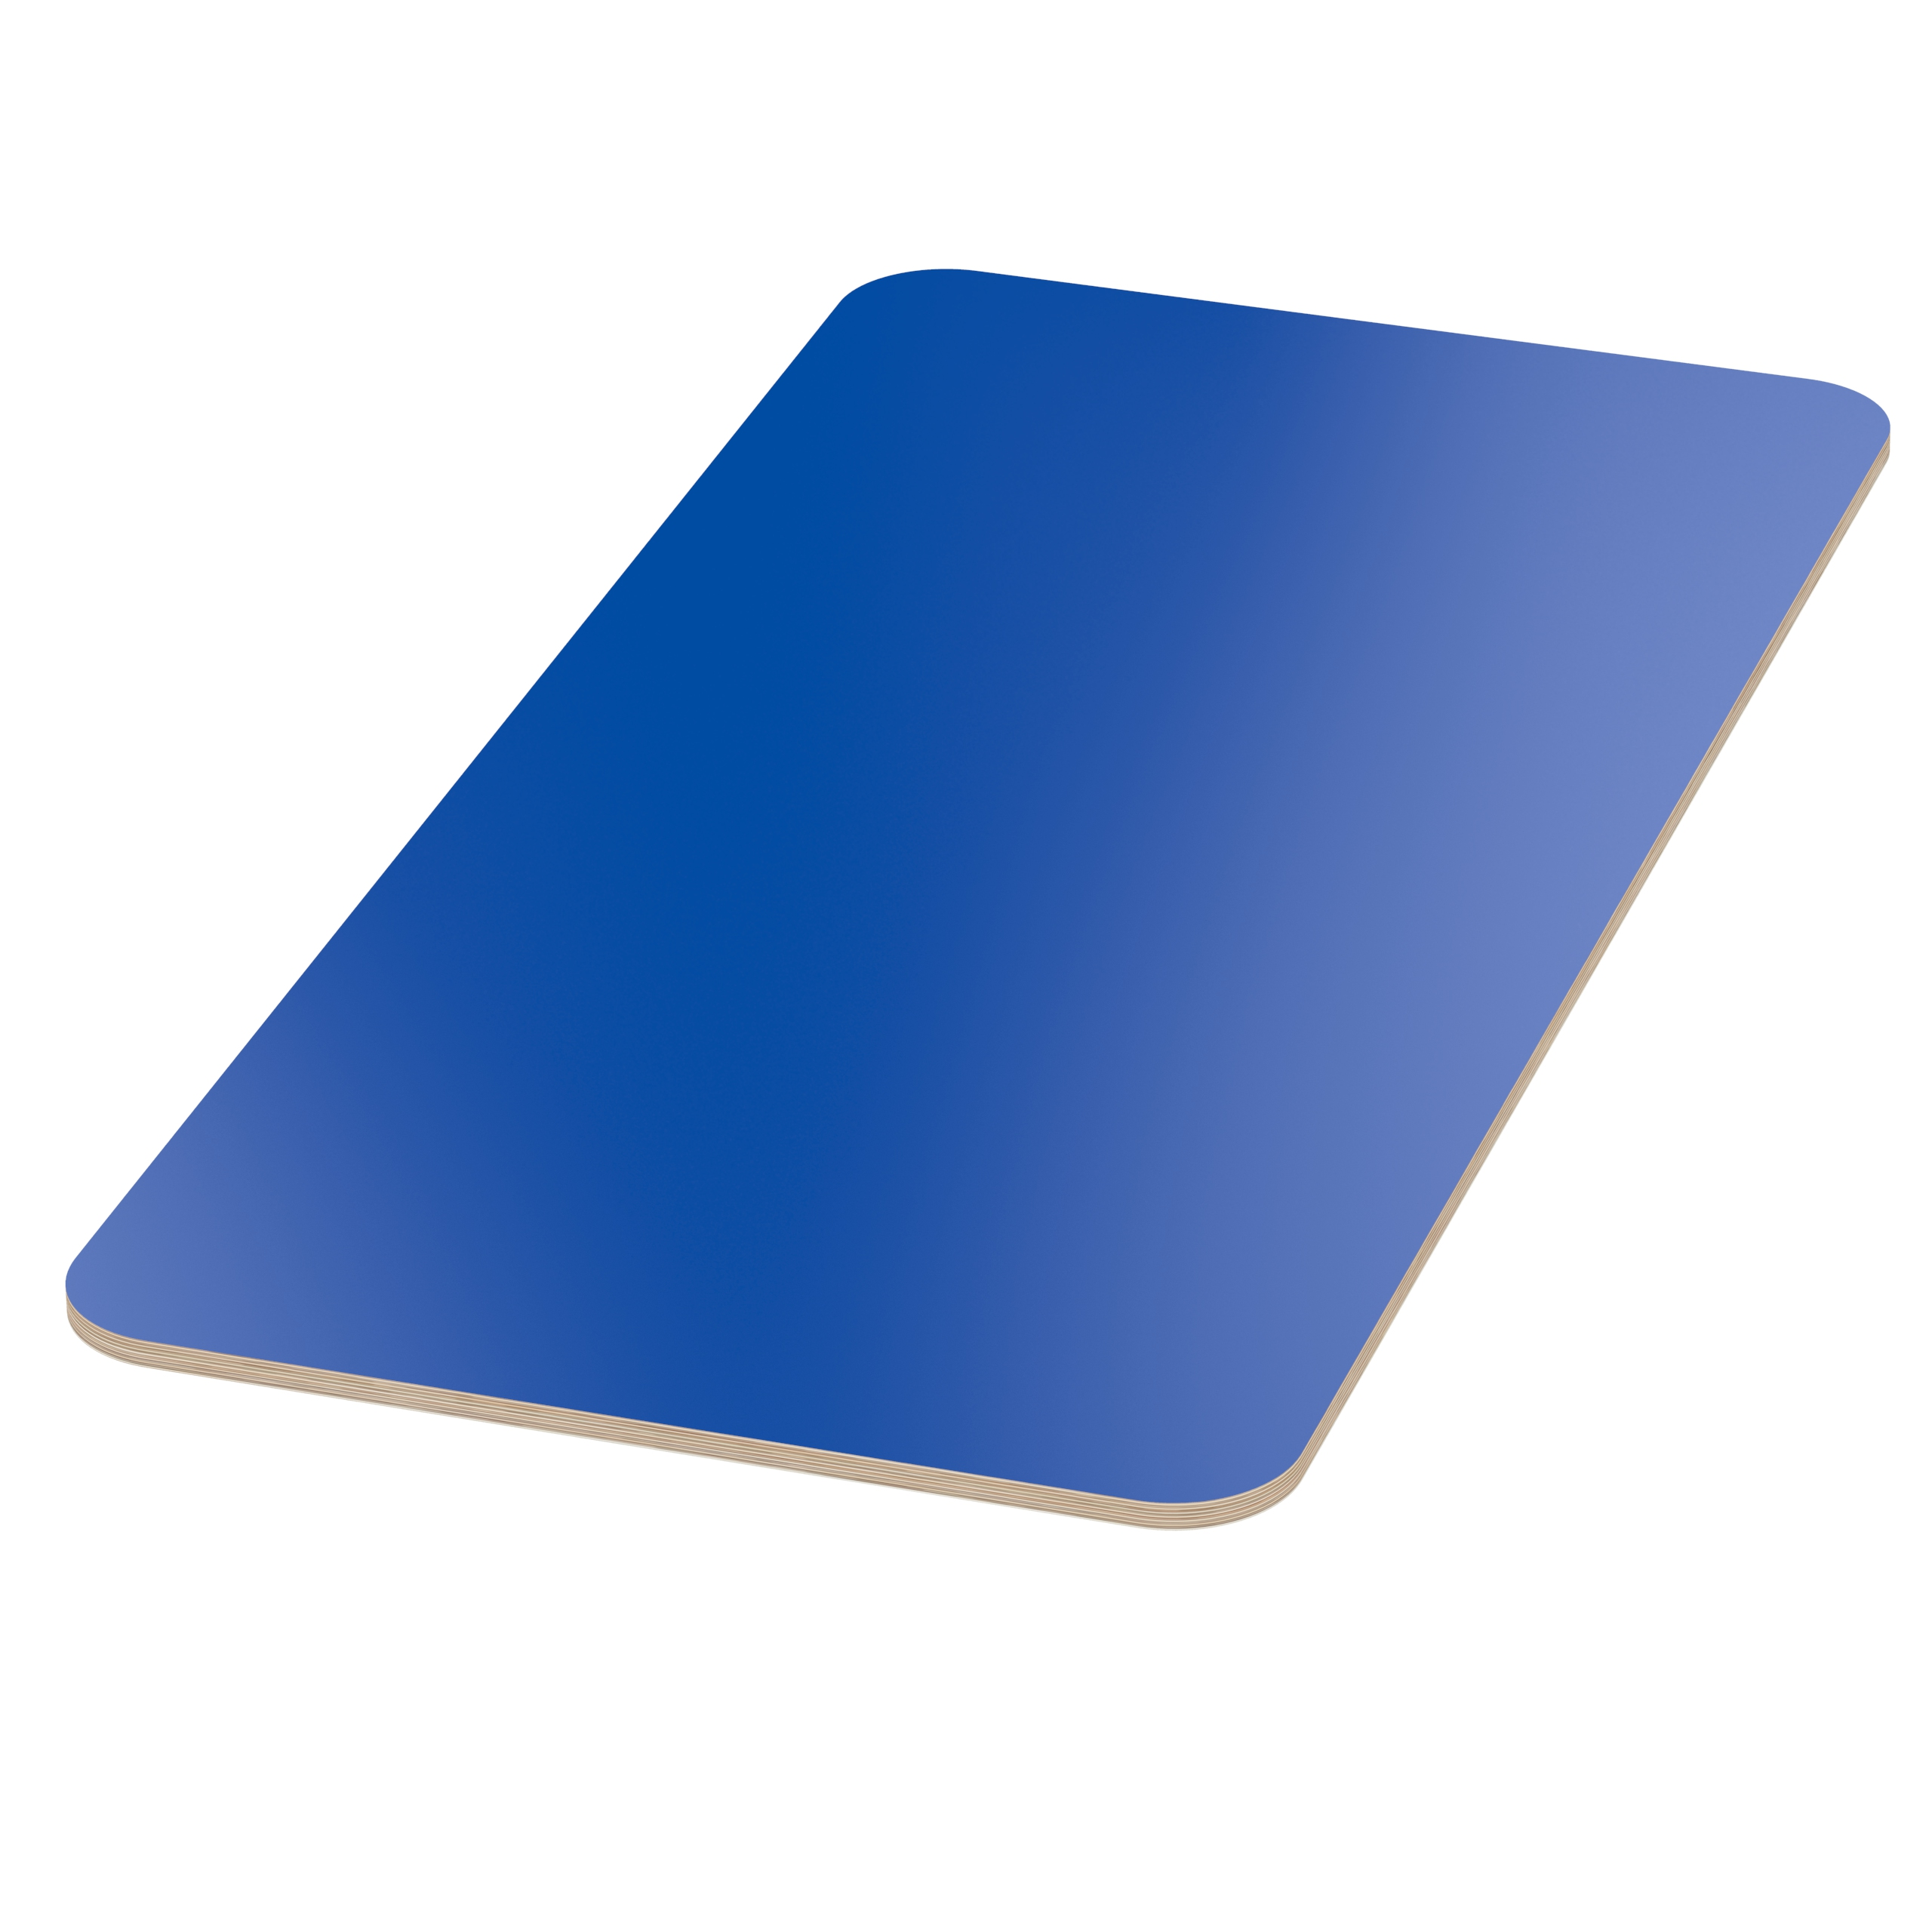 140x70 cm AUPROTEC Tischplatte 18mm wei/ß 1400 mm x 700 mm rechteckige Multiplexplatte melaminbeschichtet von 40cm-200cm ausw/ählbar Ecken Radius 100mm Birken-Sperrholzplatten Auswahl